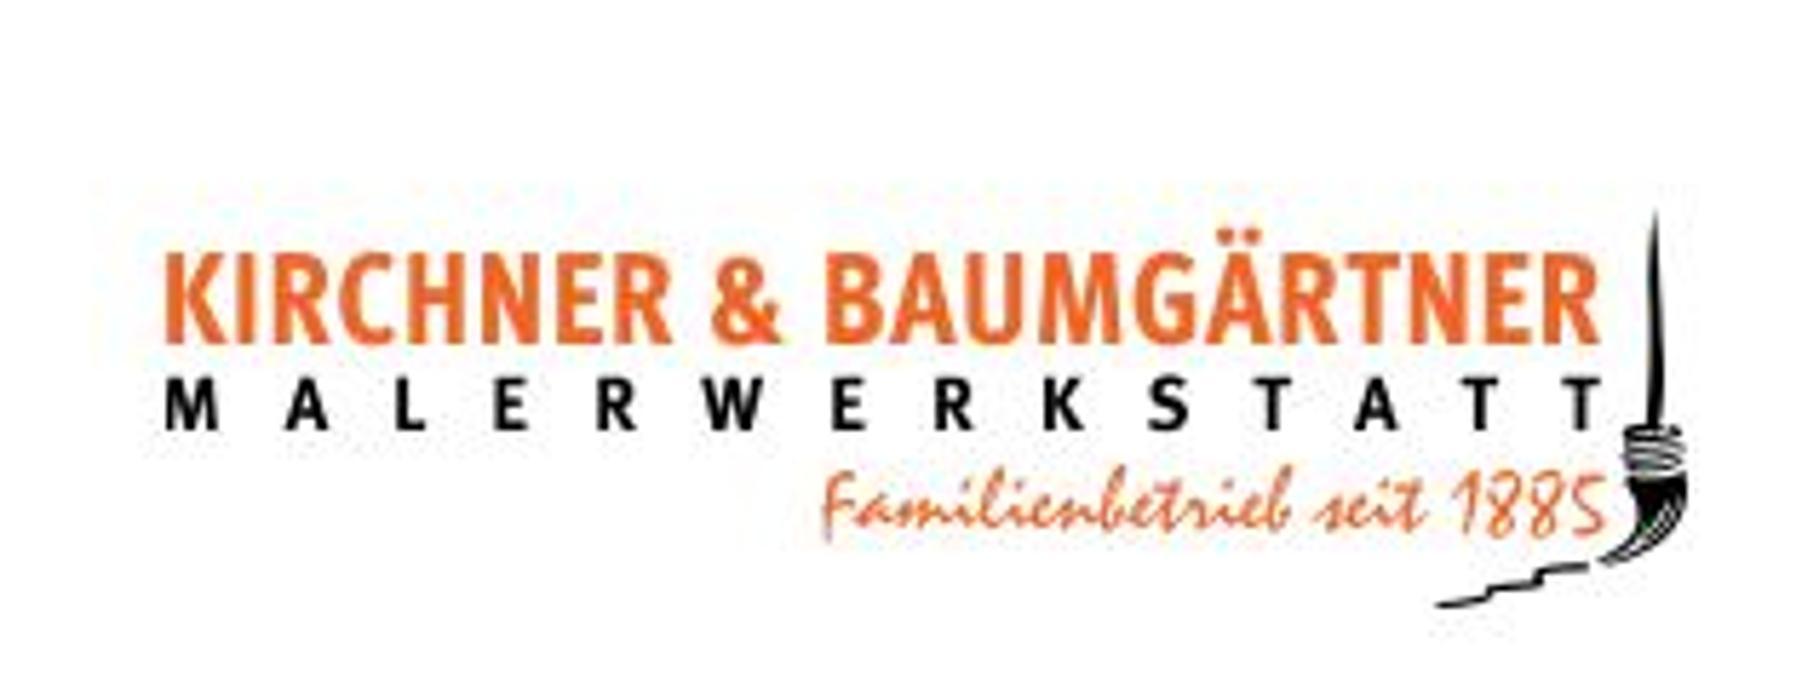 Bild zu KIRCHNER & BAUMGÄRTNER - Malerwerkstatt in Hemmingen in Württemberg